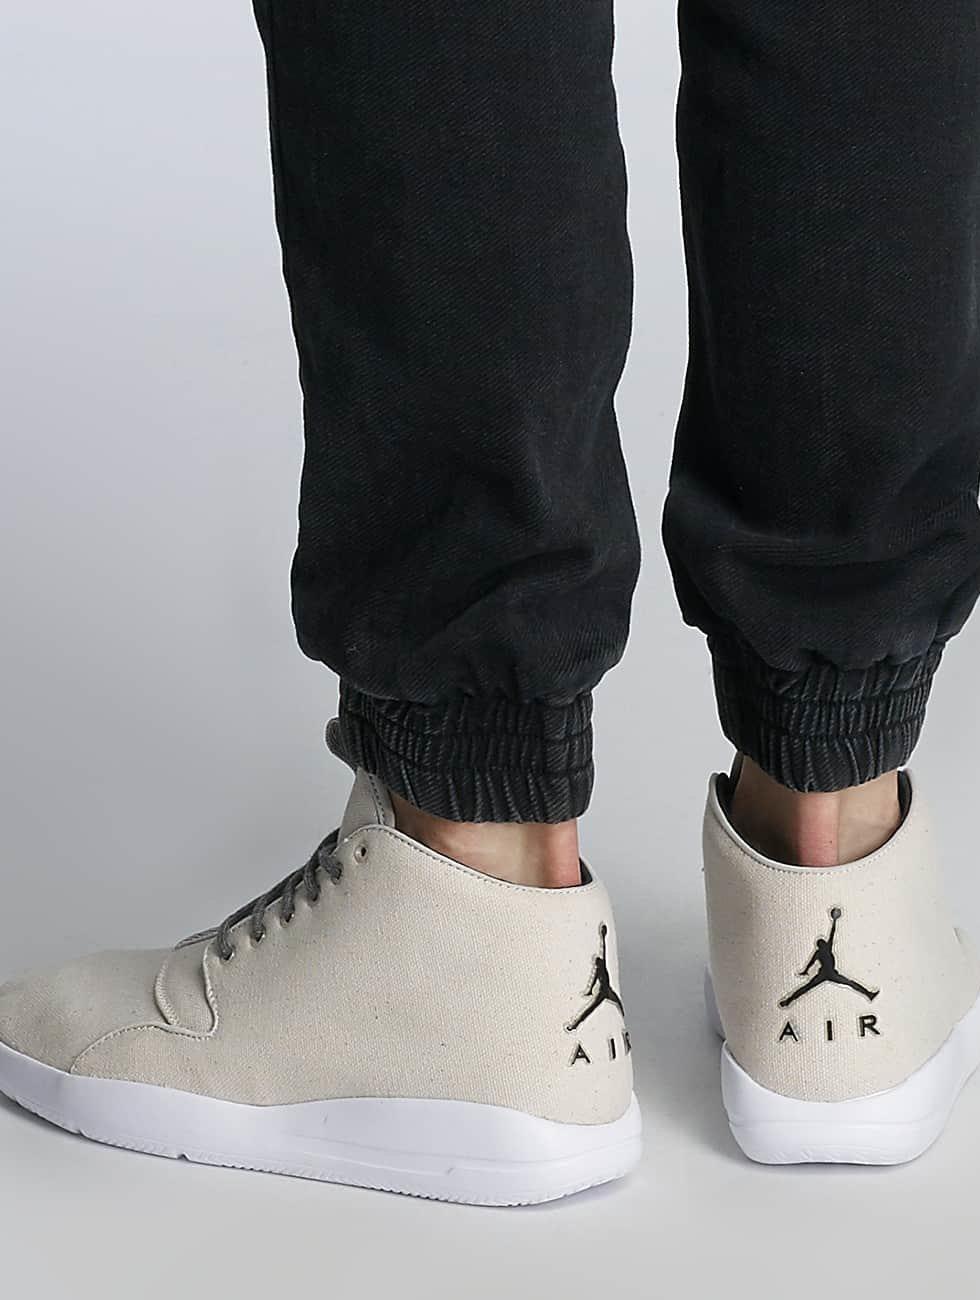 Kopen Goedkope Grote Verkoop Kopen Goedkope Buy Jordan schoen / sneaker Eclipse Chukka Sneakers in khaki 307619 Grootste Leverancier levering s9T19WgJI